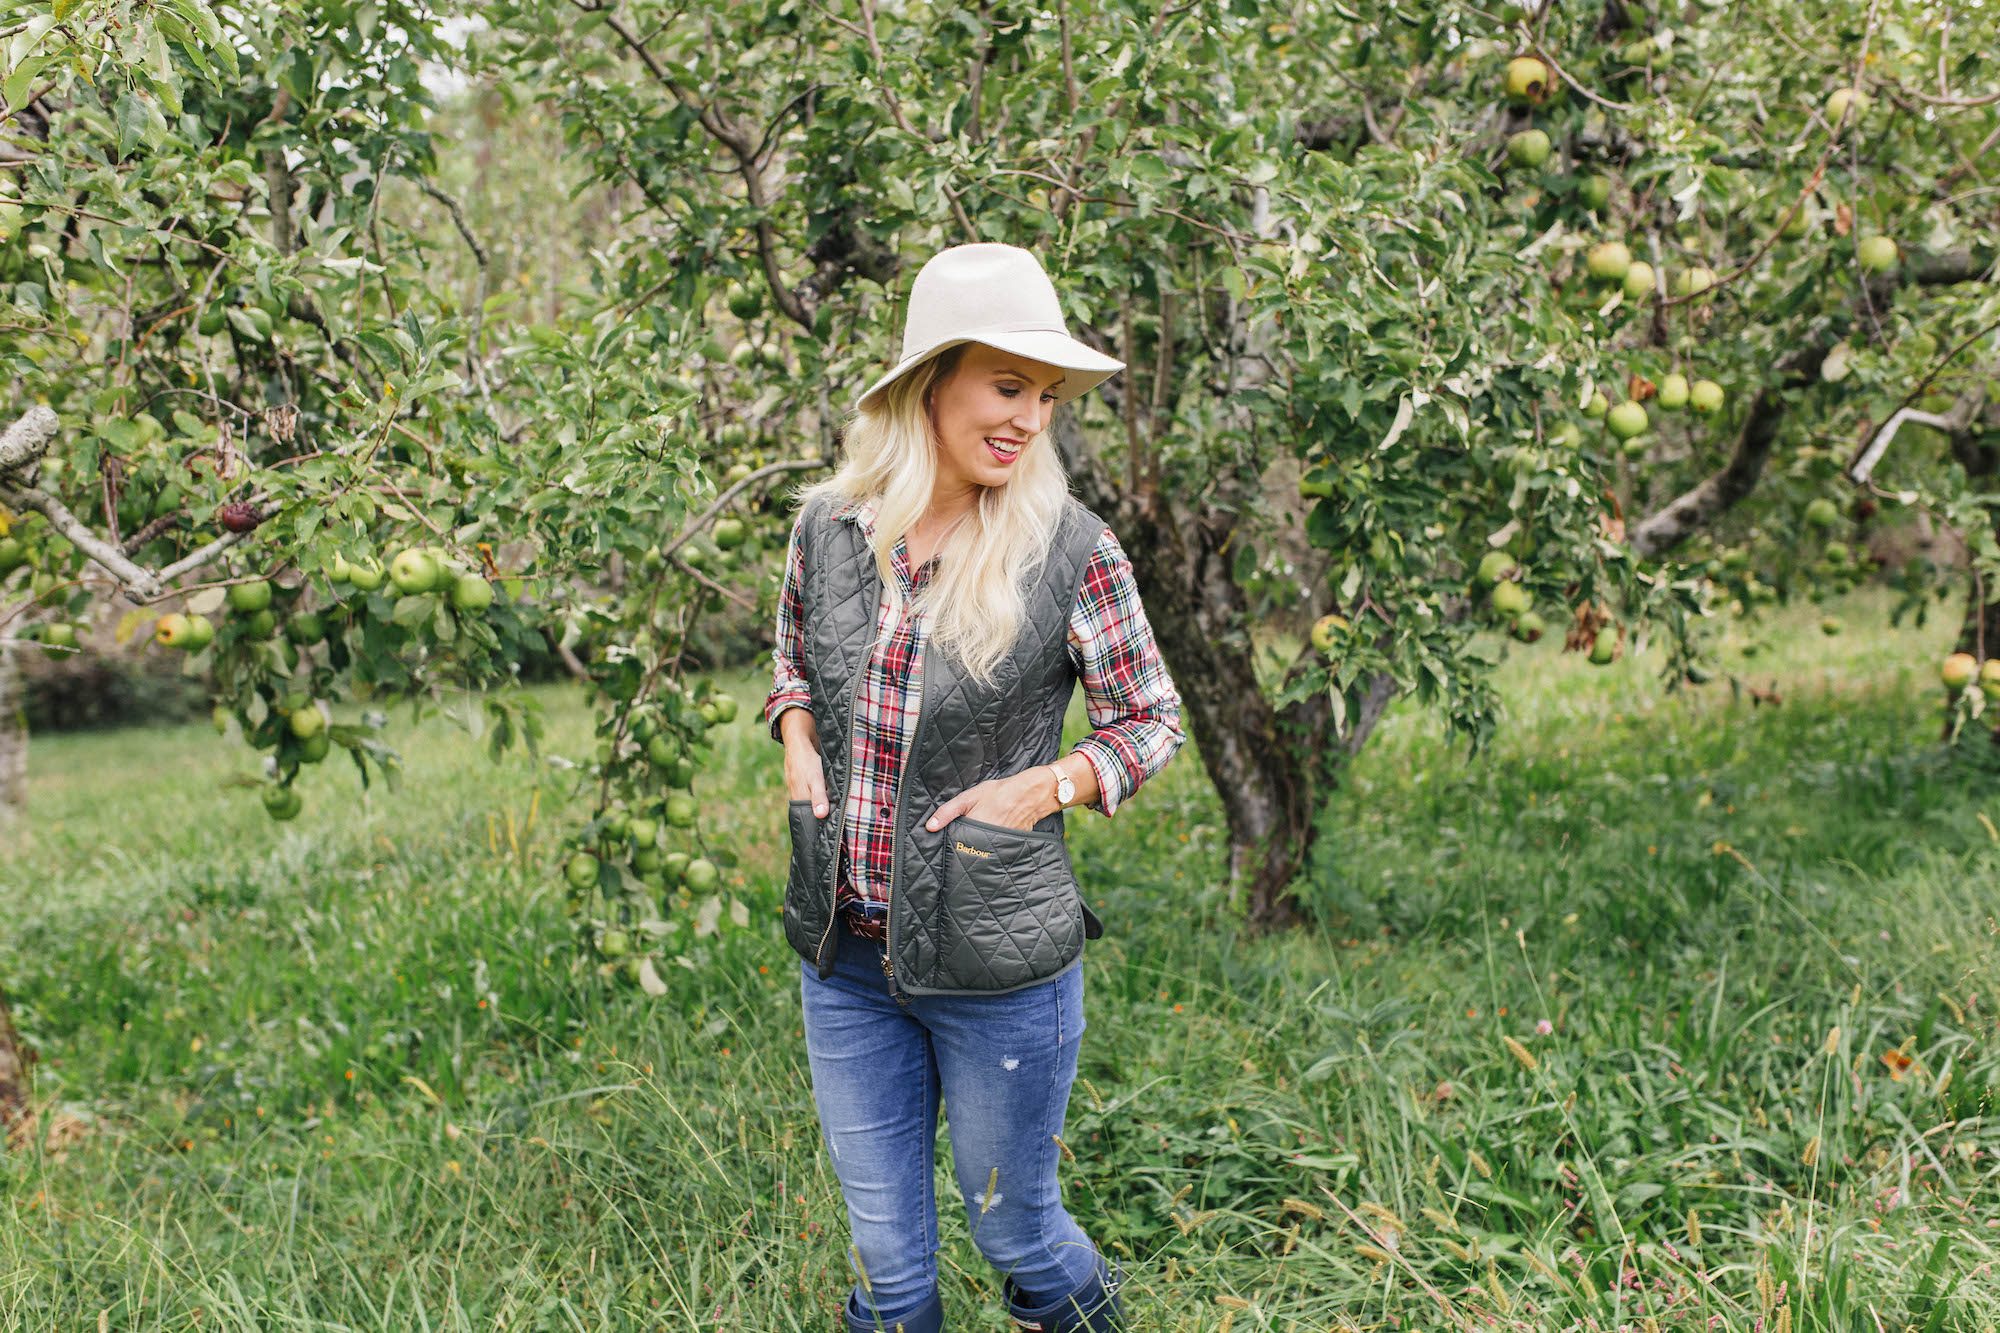 Allison-Cawley-Fall-Essentials-Peachfully-Chic-11